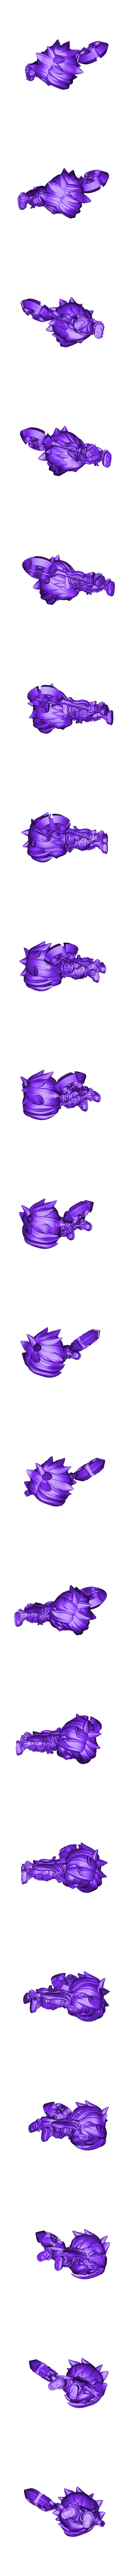 Creator_Takoyaki_Without_Base.stl Télécharger fichier STL gratuit Chibi Creator Takoyaki - Ragnarok Online Fan Art • Objet à imprimer en 3D, HyperMiniatures